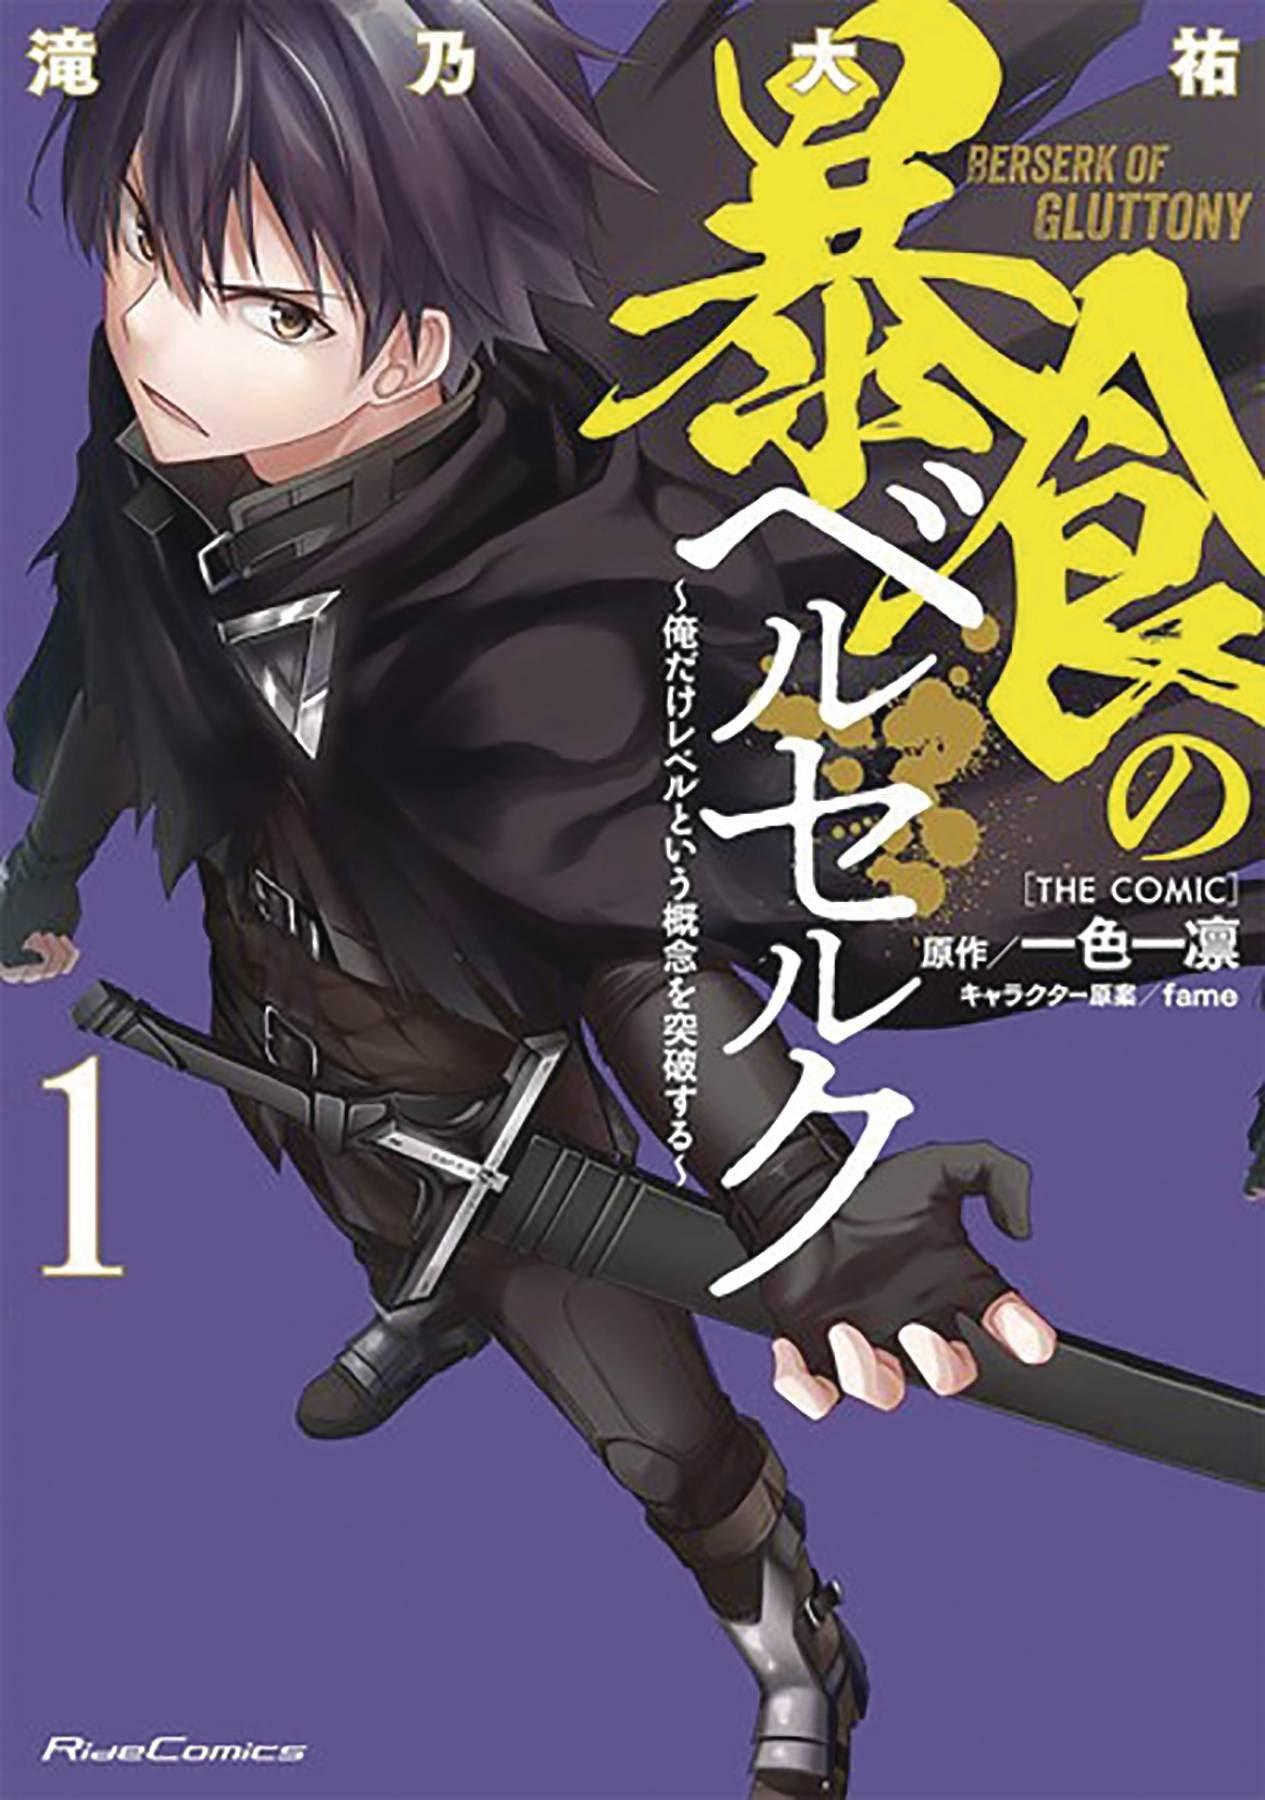 Beserk of Gluttony Volume 1 - A Manga Graphic Novel